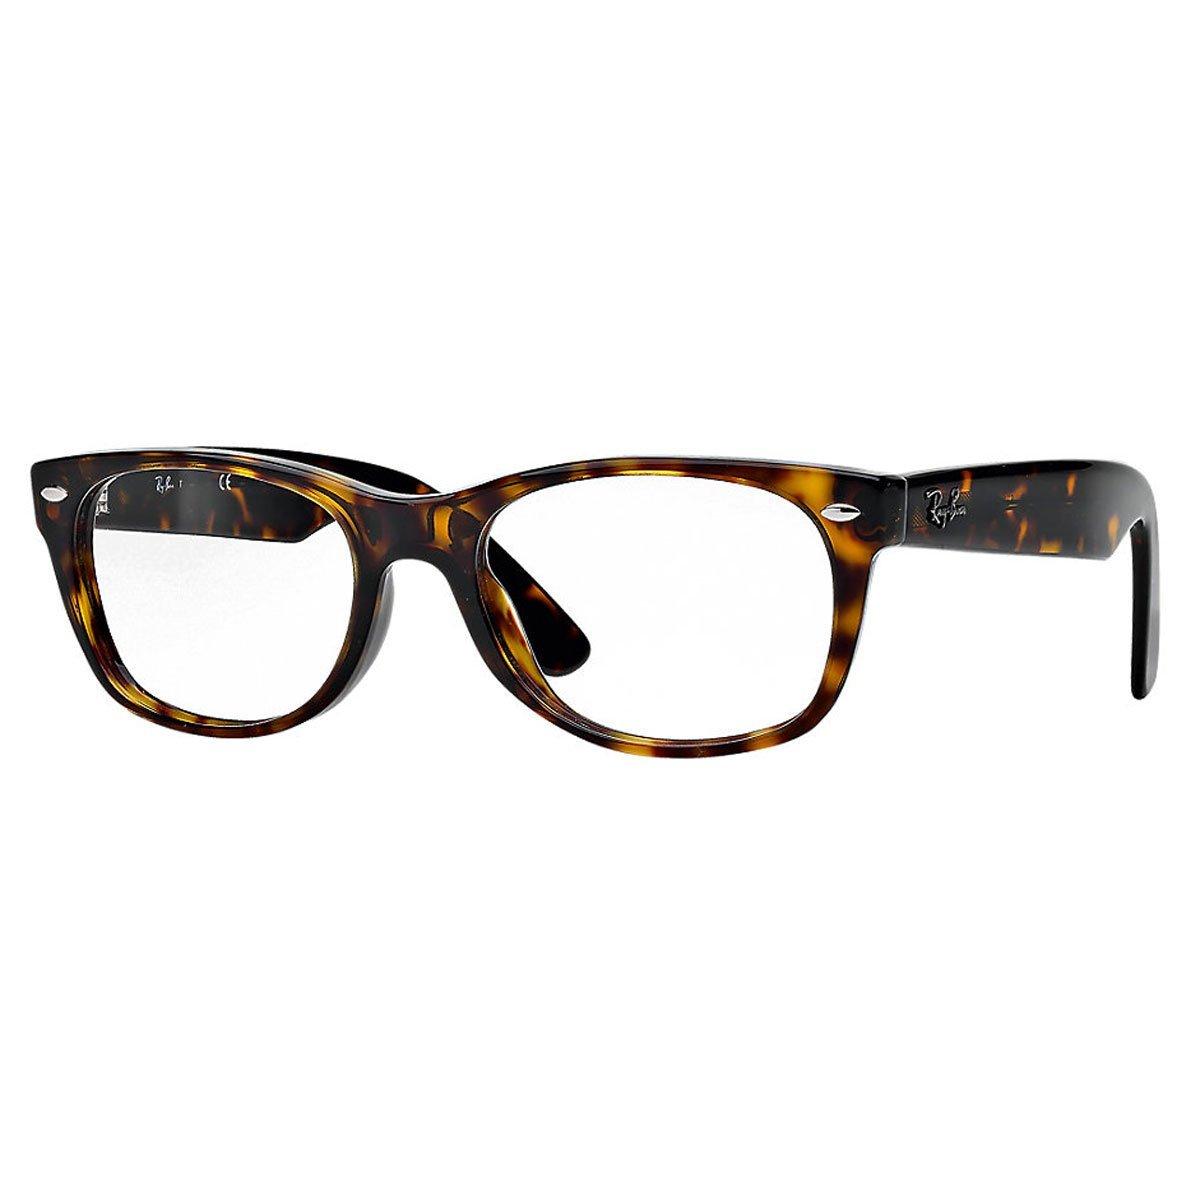 Ray-Ban New Wayfarer Square Eyeglasses,Dark Havana,50 mm